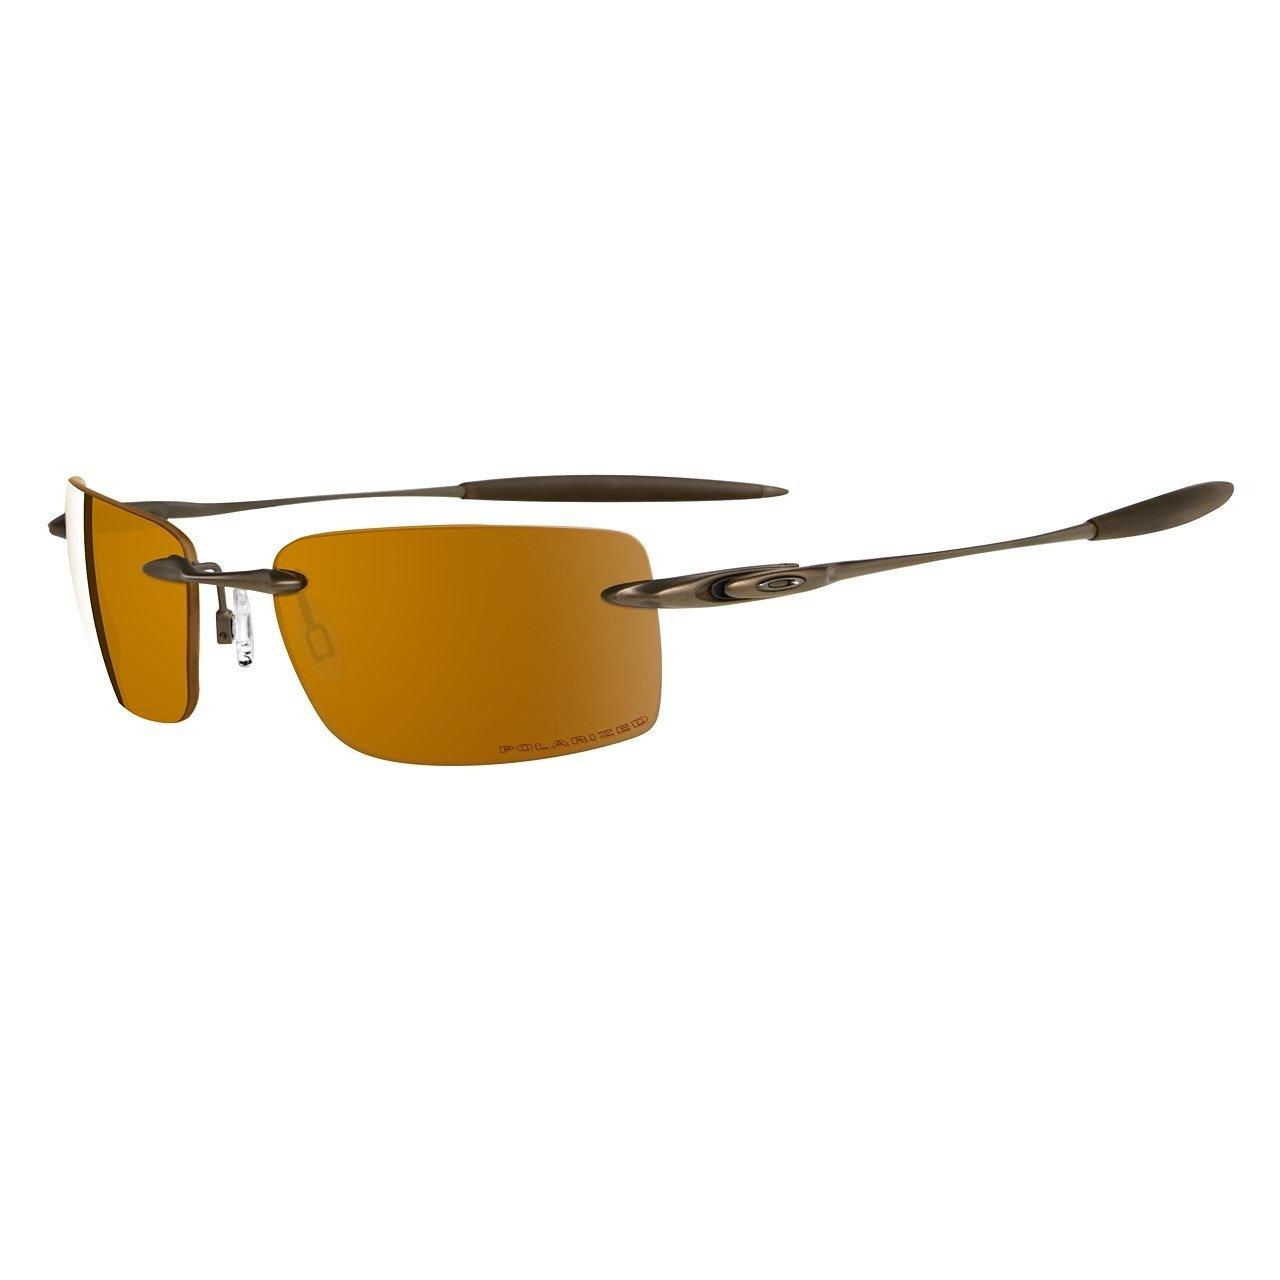 oakley why sunglasses